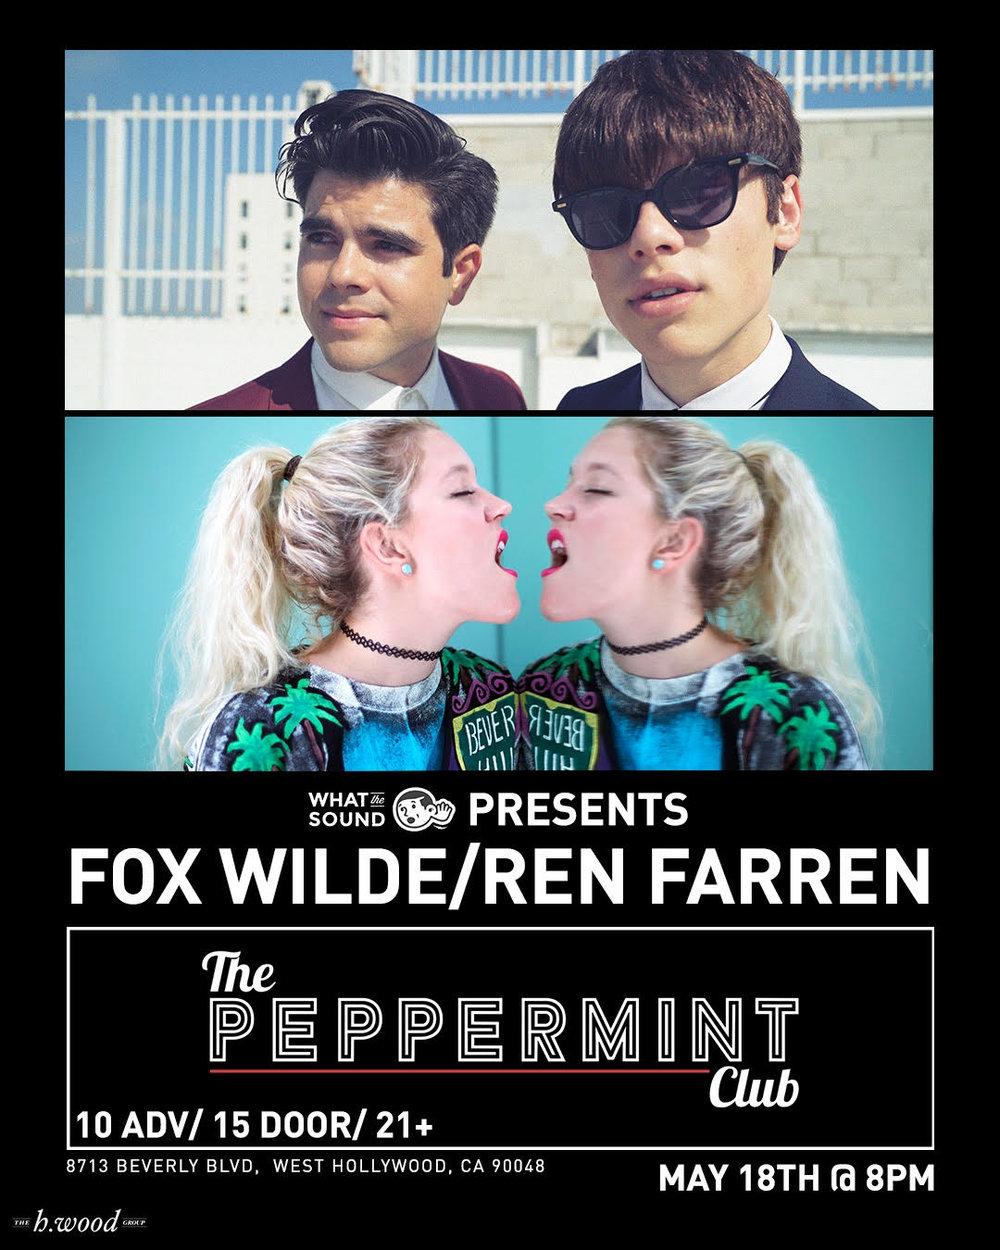 FOX WILDE / REN FARREN - May 18 @ The Peppermint Club$10 ADV / $15 DOS21+